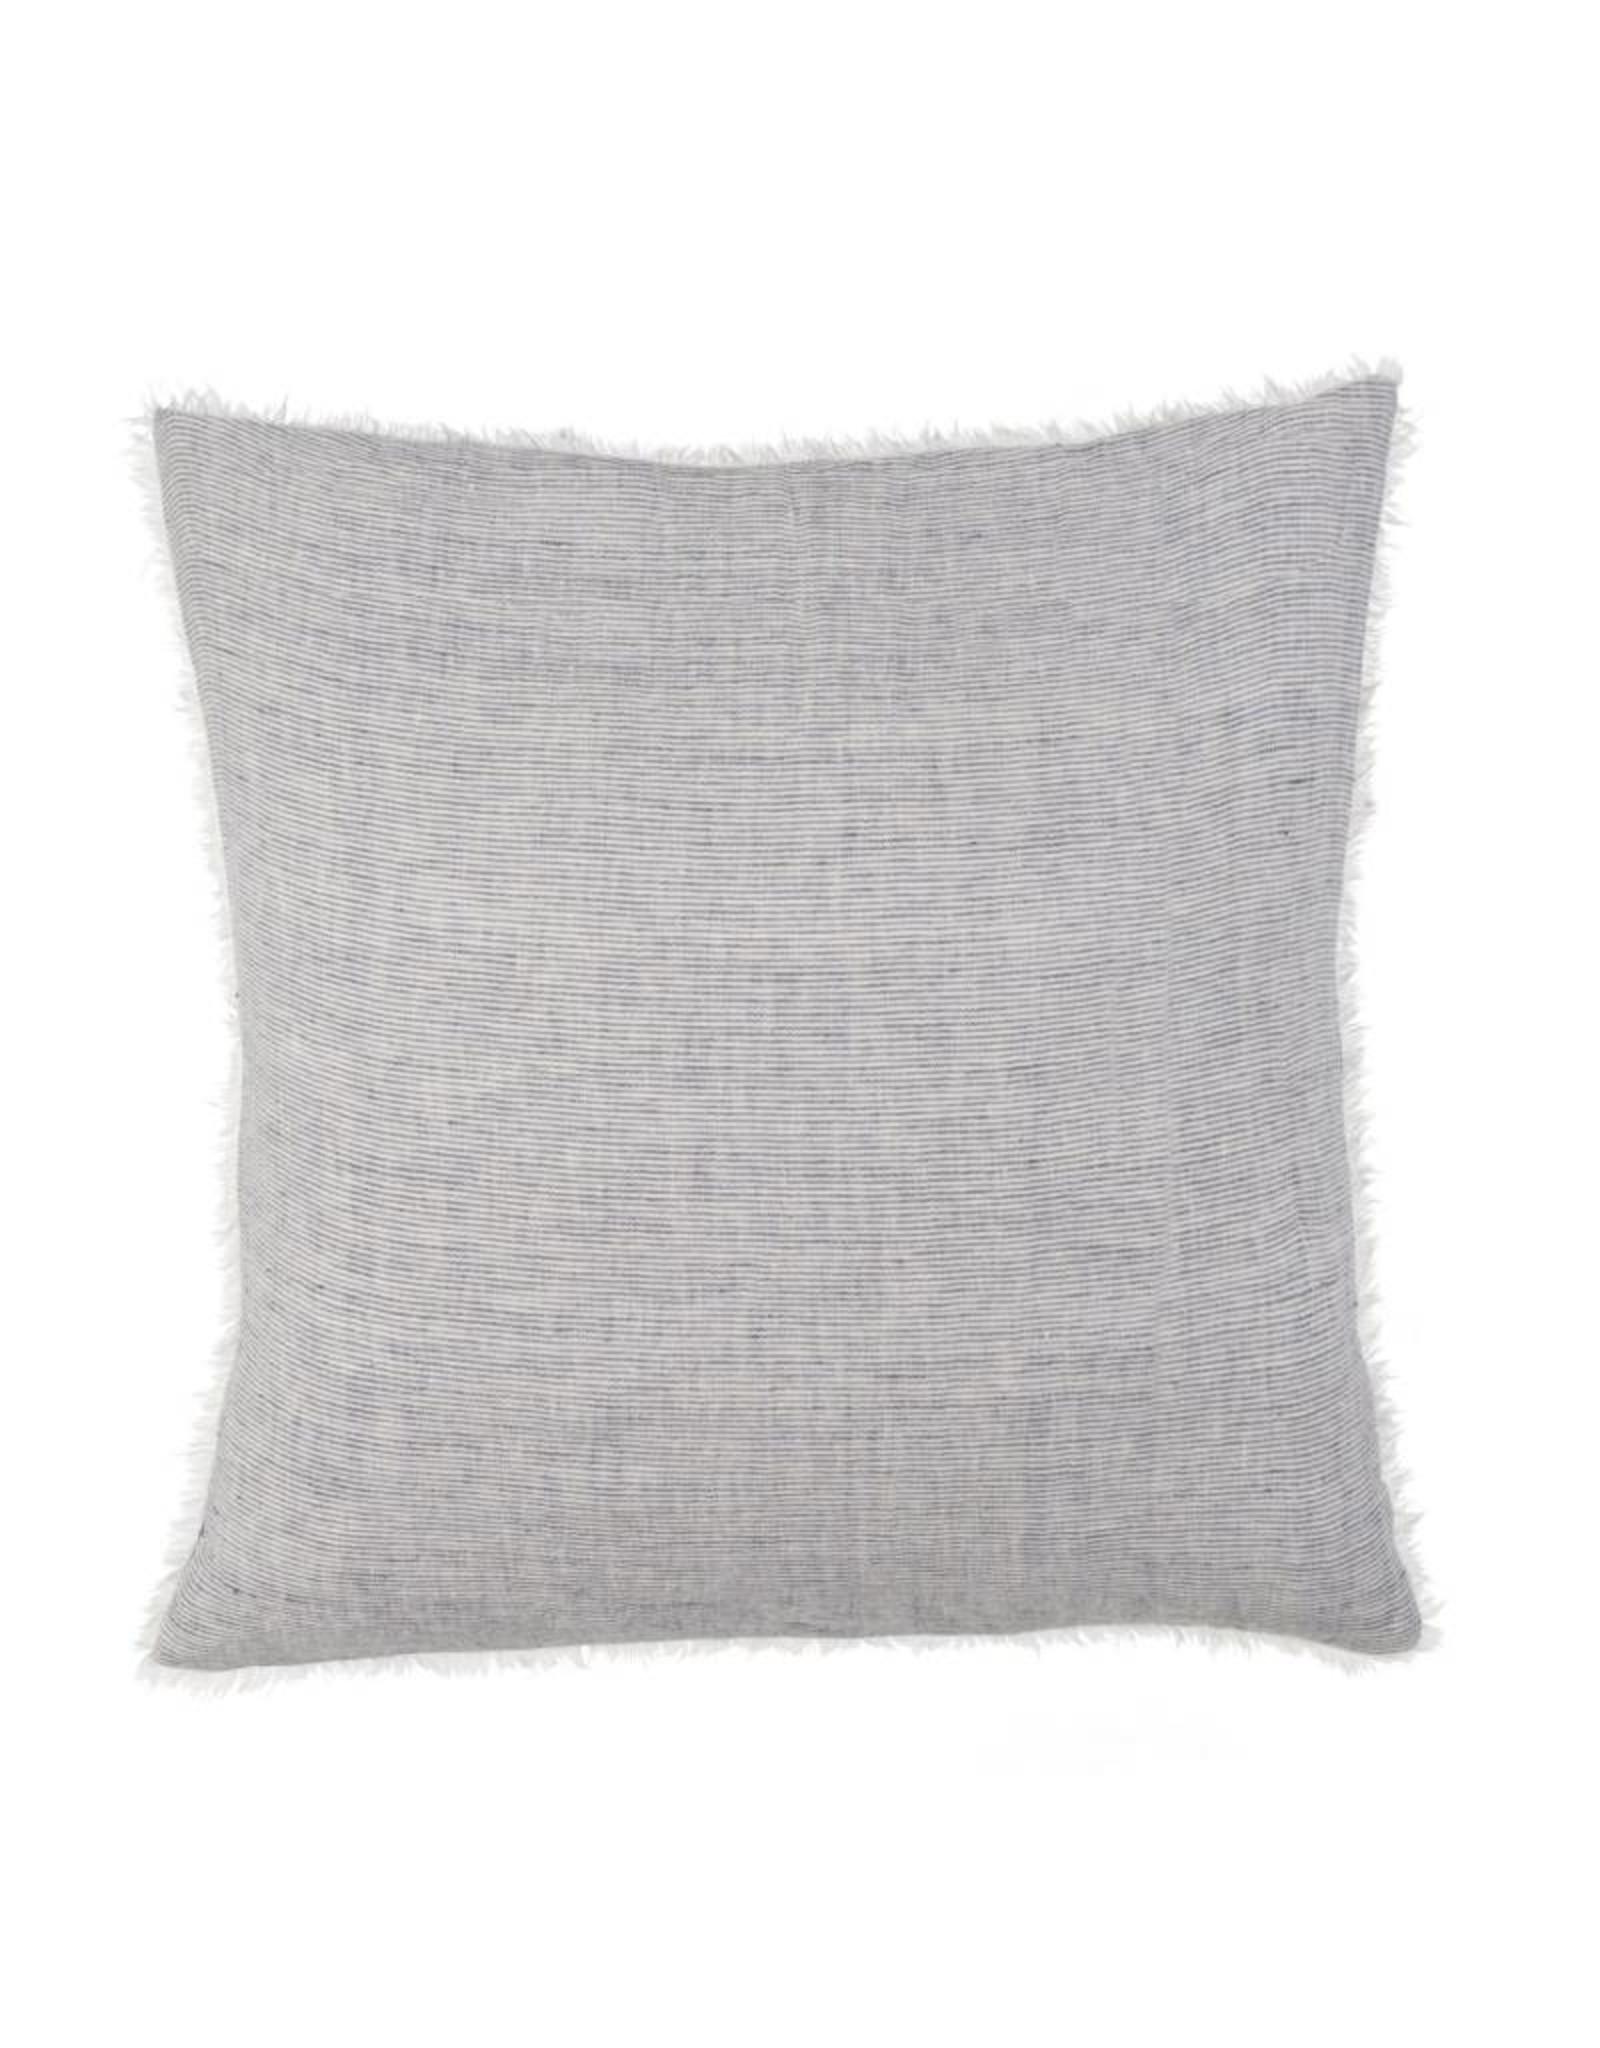 Indaba Lina Linen Pillow - Stripe